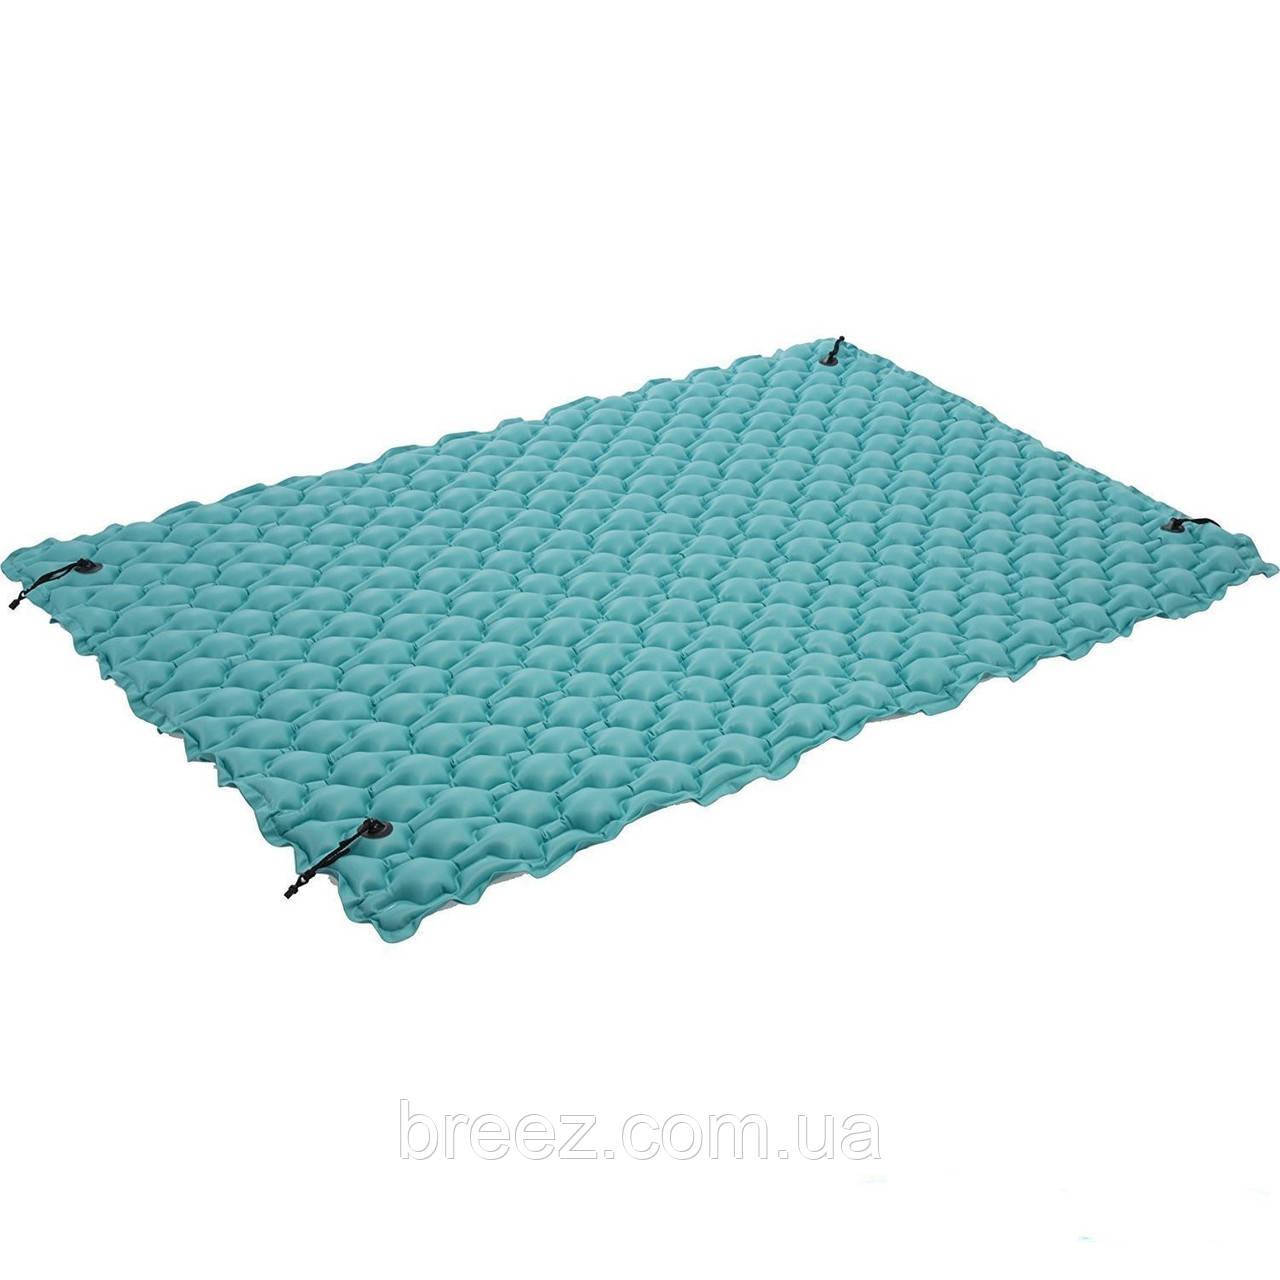 Надувной матрас для плаванья Intex Гигант 290 х 213 см